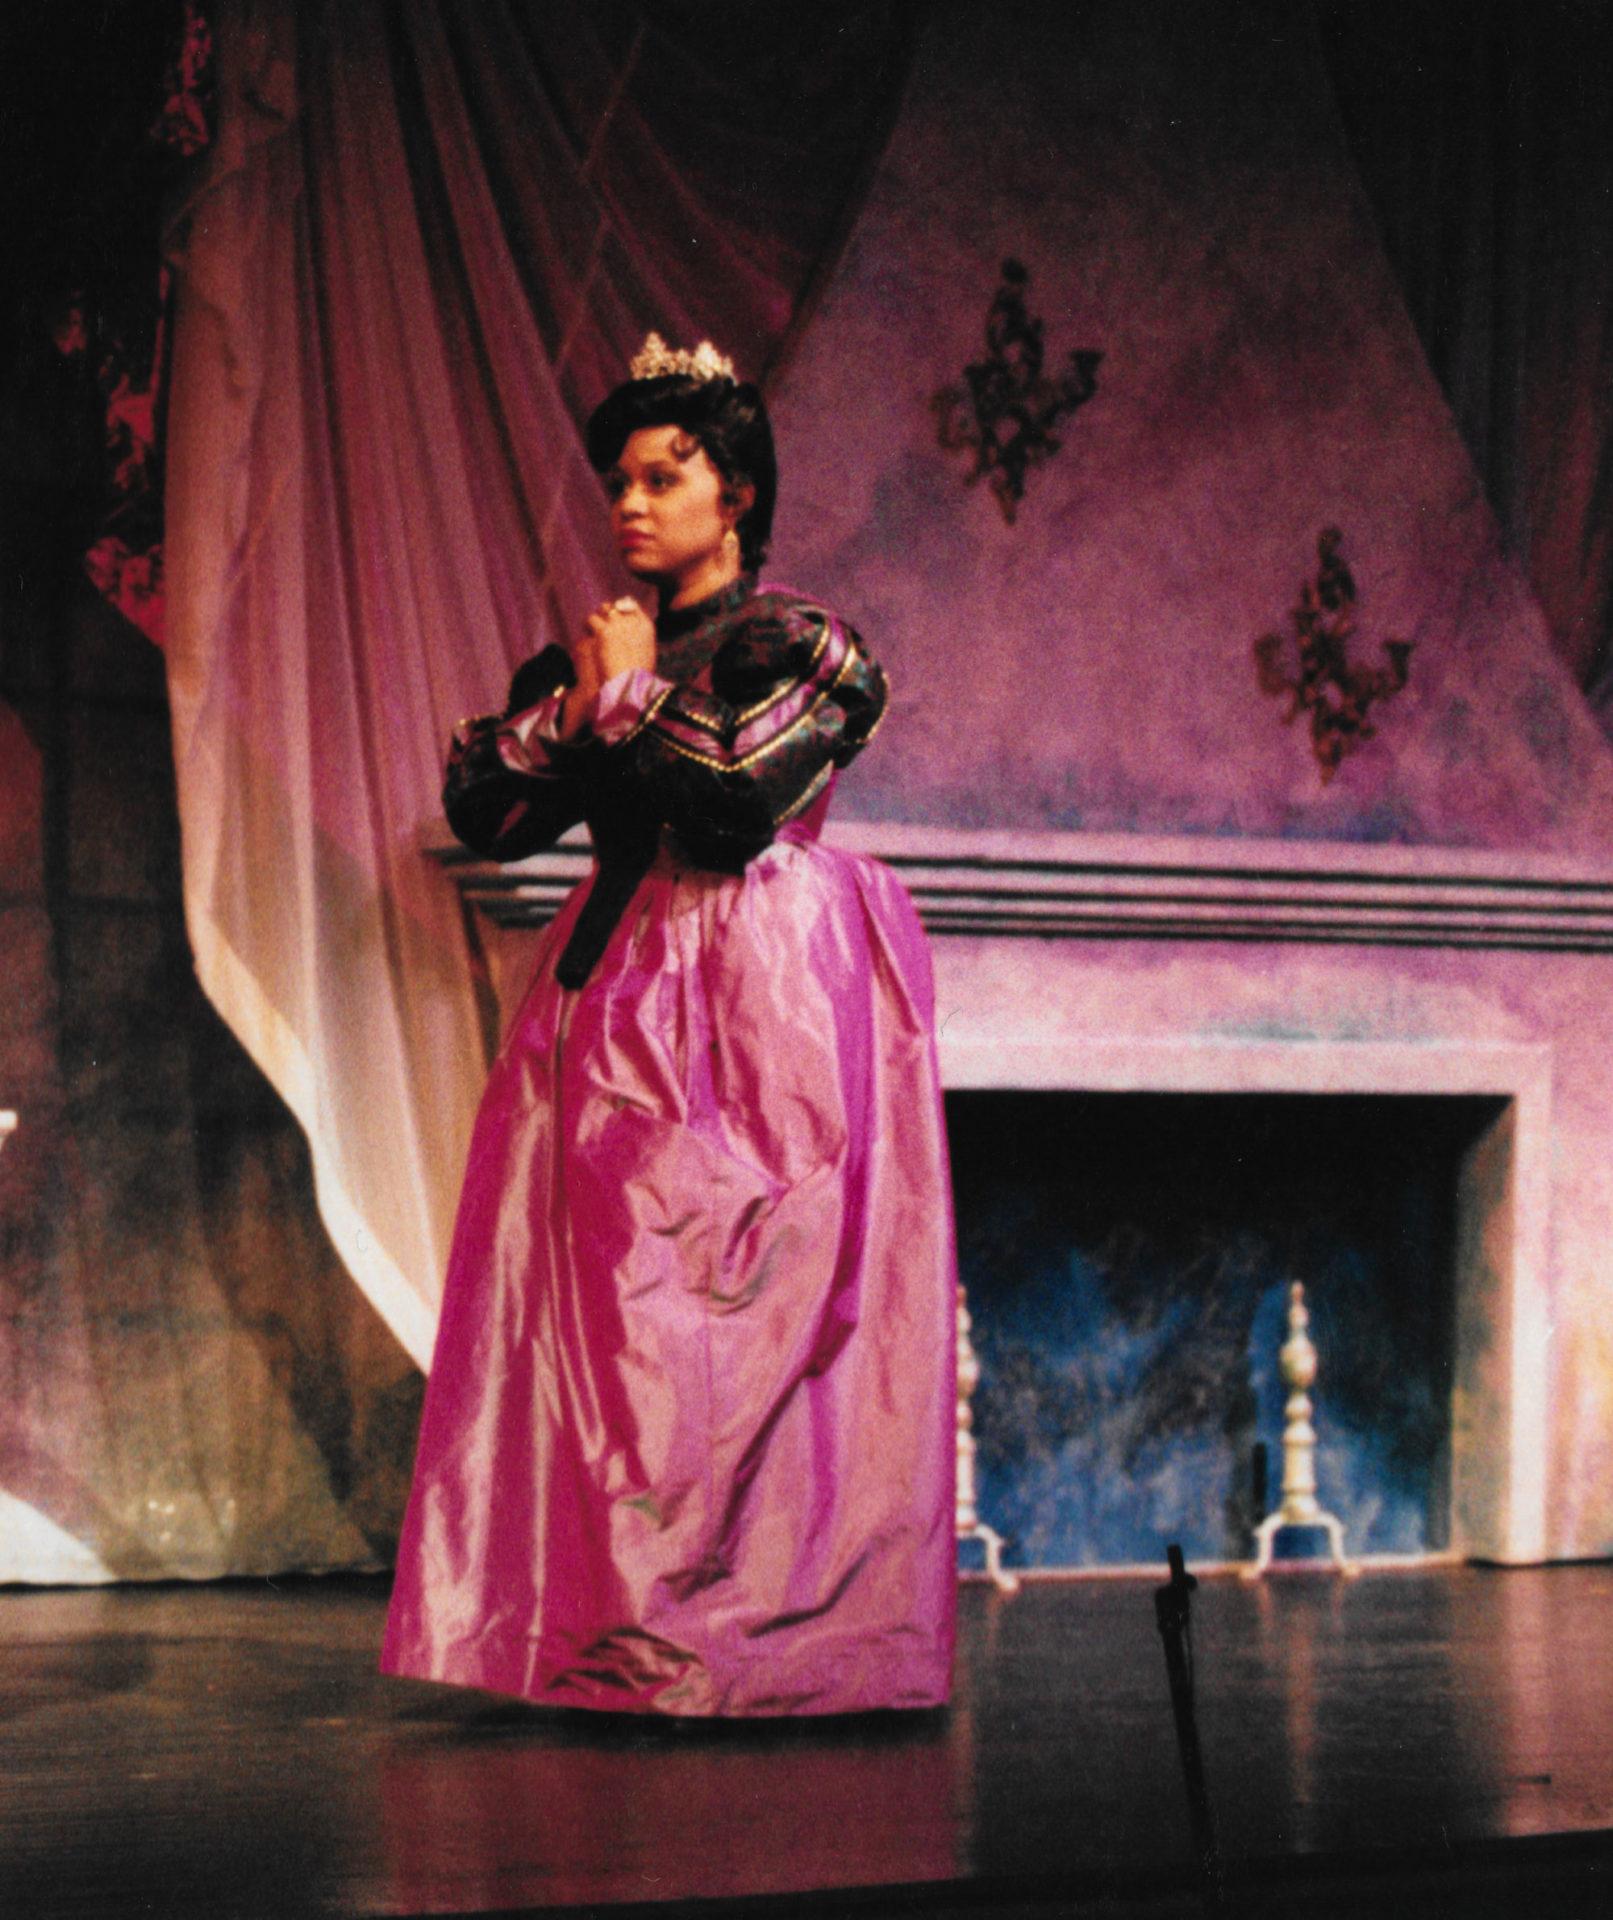 Anita on stage in Cinderella.